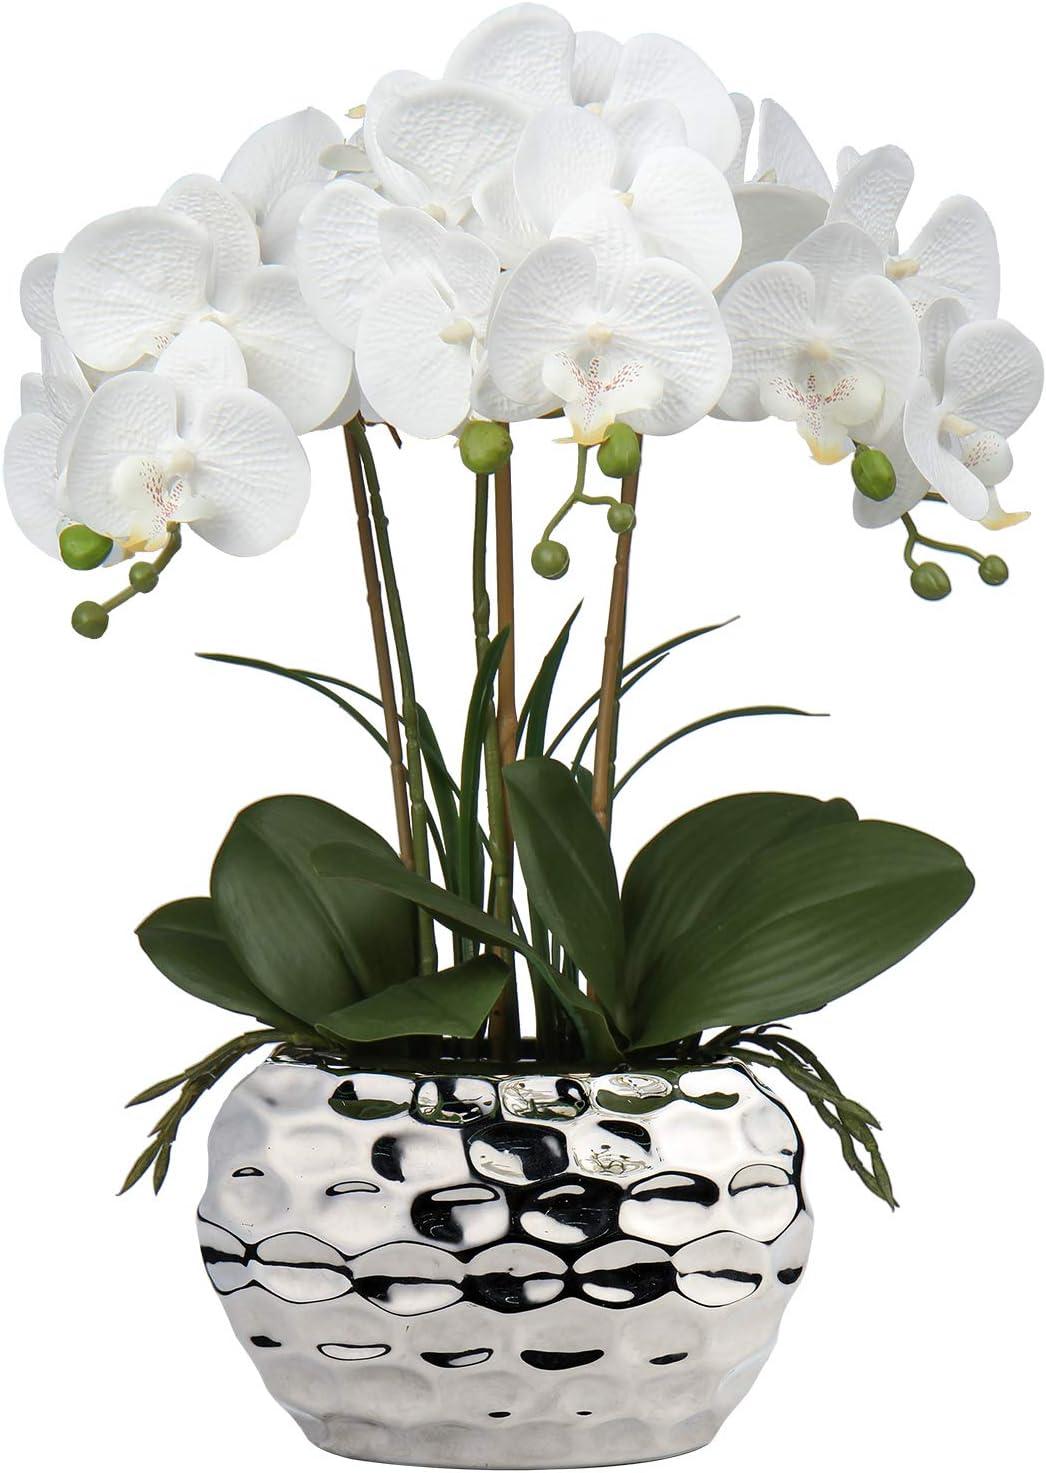 Artificial Orchid, Faux Phalaenopsis Orchid Silk Flower Arrangement Tall Fake Orchid Flowers Plant Ceramics Pot Arrangements for Home Table Office Party Table Decor